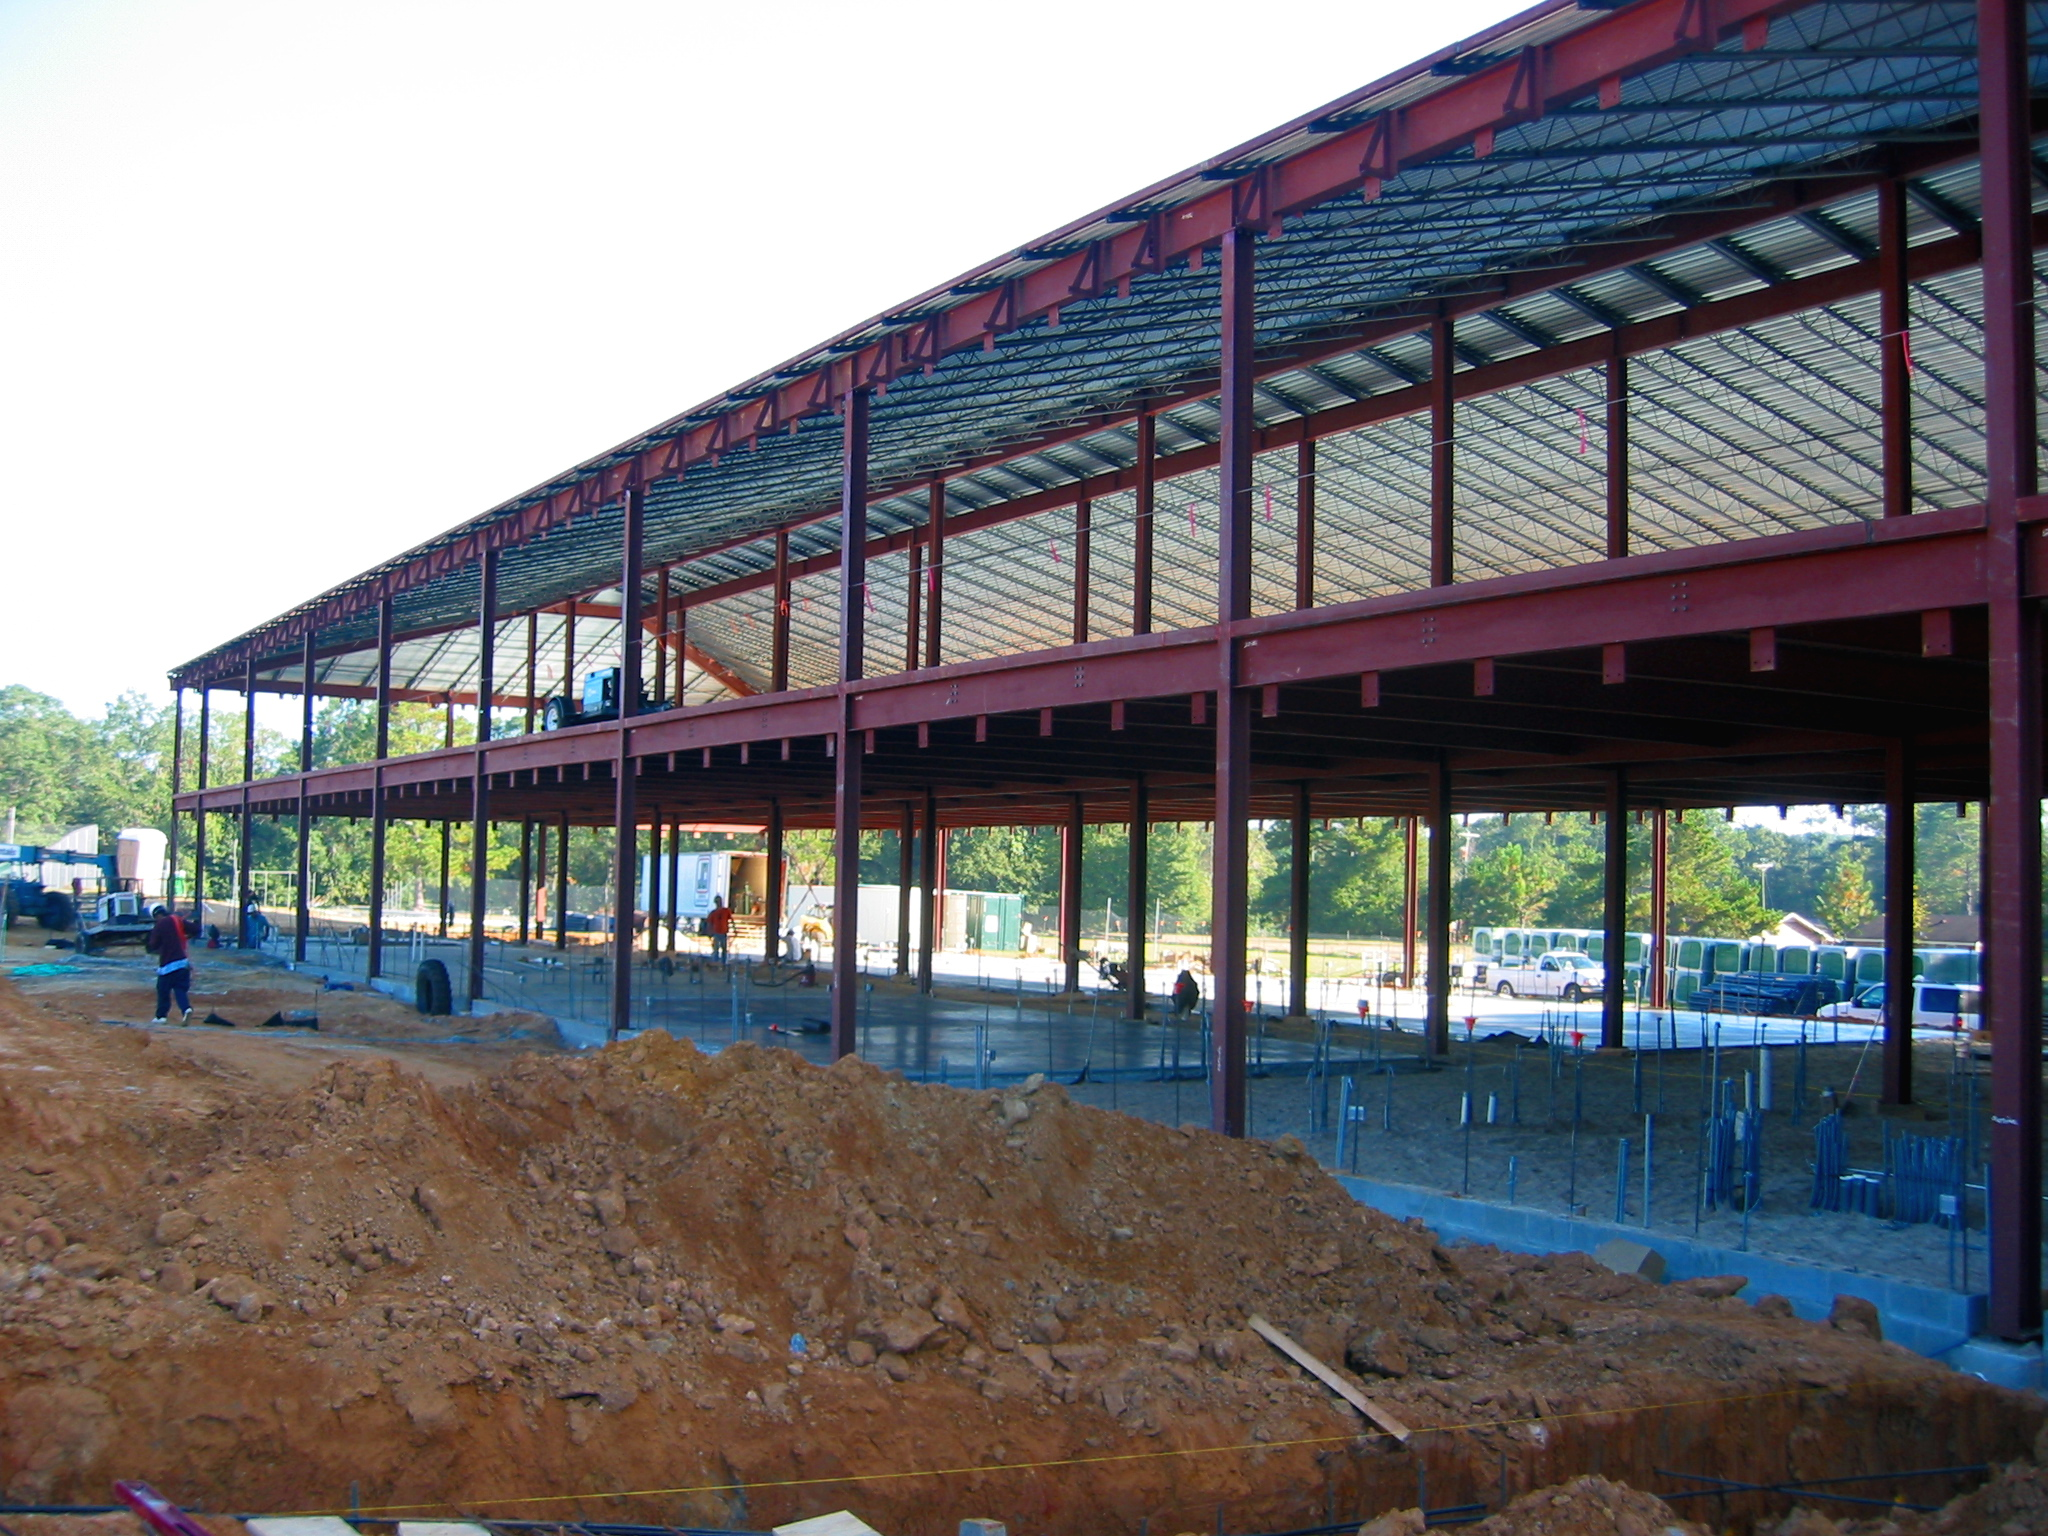 Structural Interior - Cox Elementary School